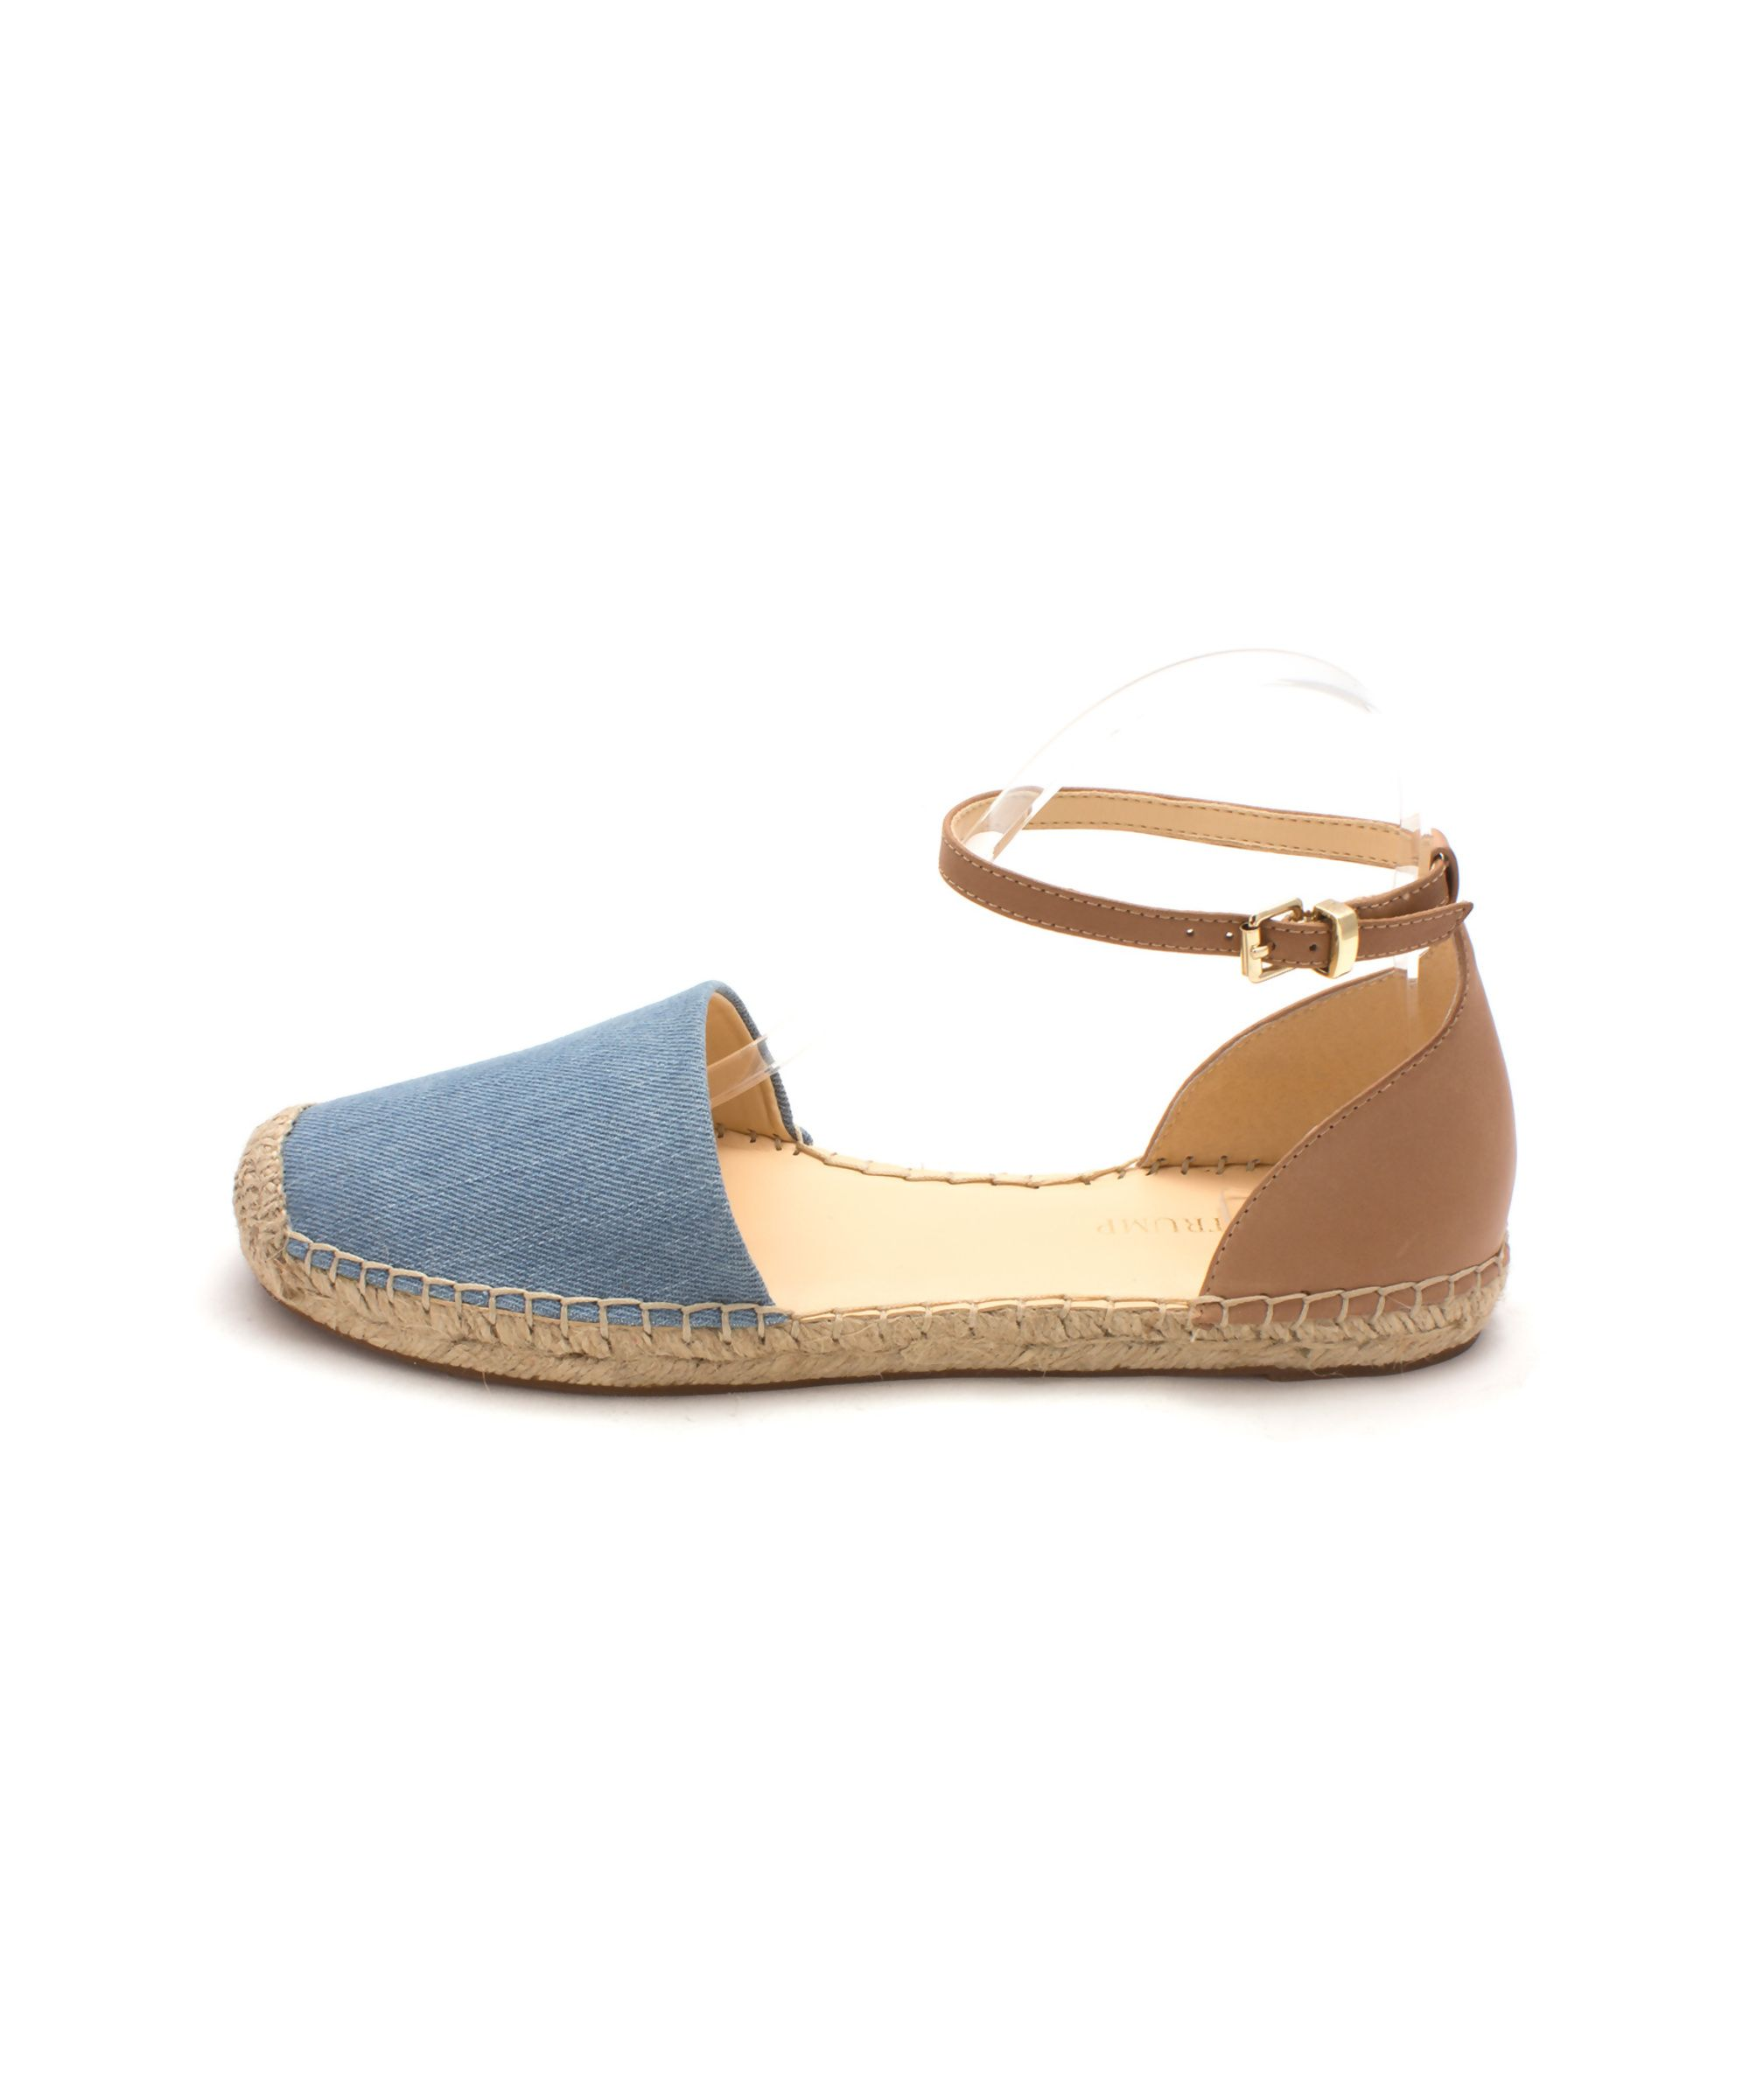 IVANKA TRUMP | Ivanka Trump Womens Vailea Leather Closed Toe Ankle Strap  Espadrille Flats #Shoes